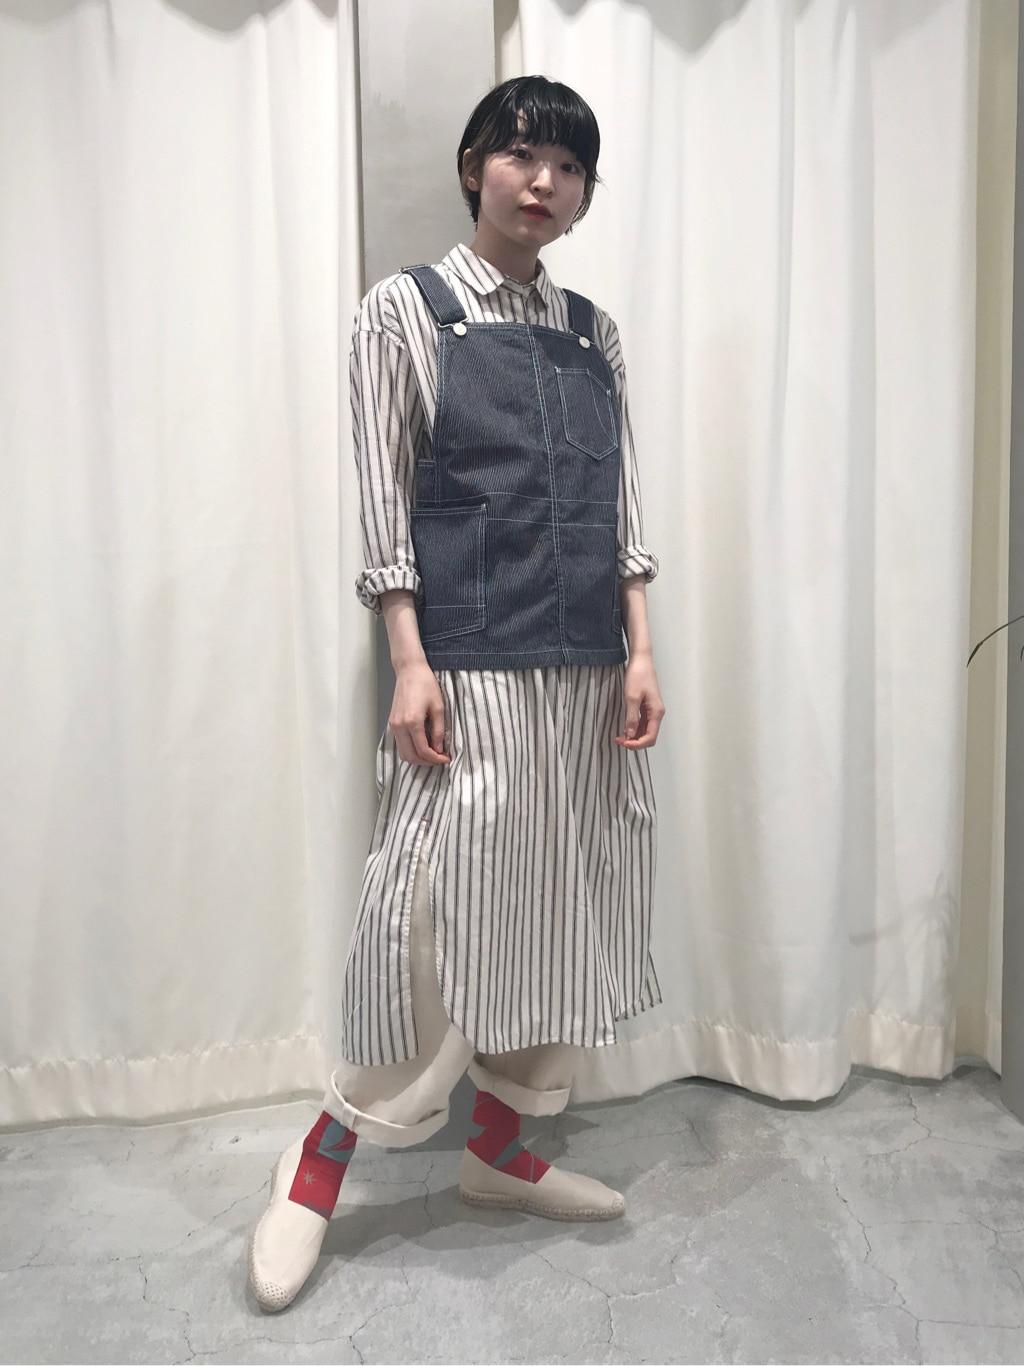 Dot and Stripes CHILD WOMAN ルミネ池袋 身長:163cm 2020.07.18